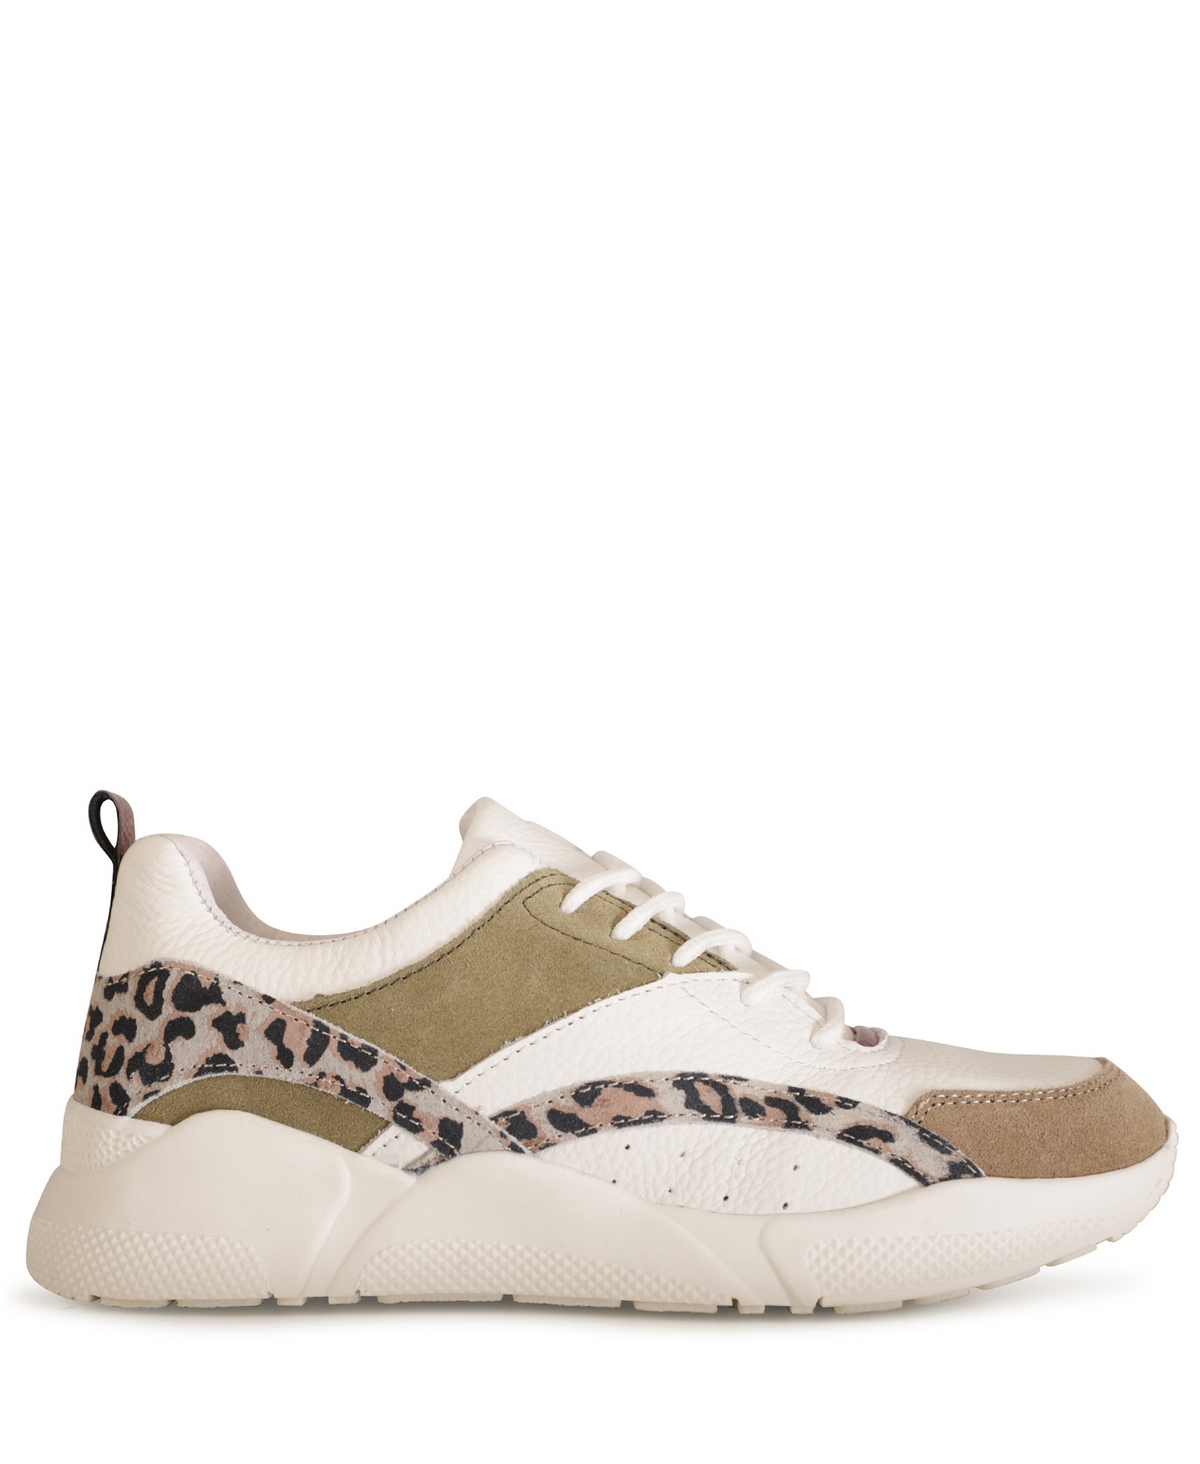 Shoecolate Sneaker Groen 8.10.06.071